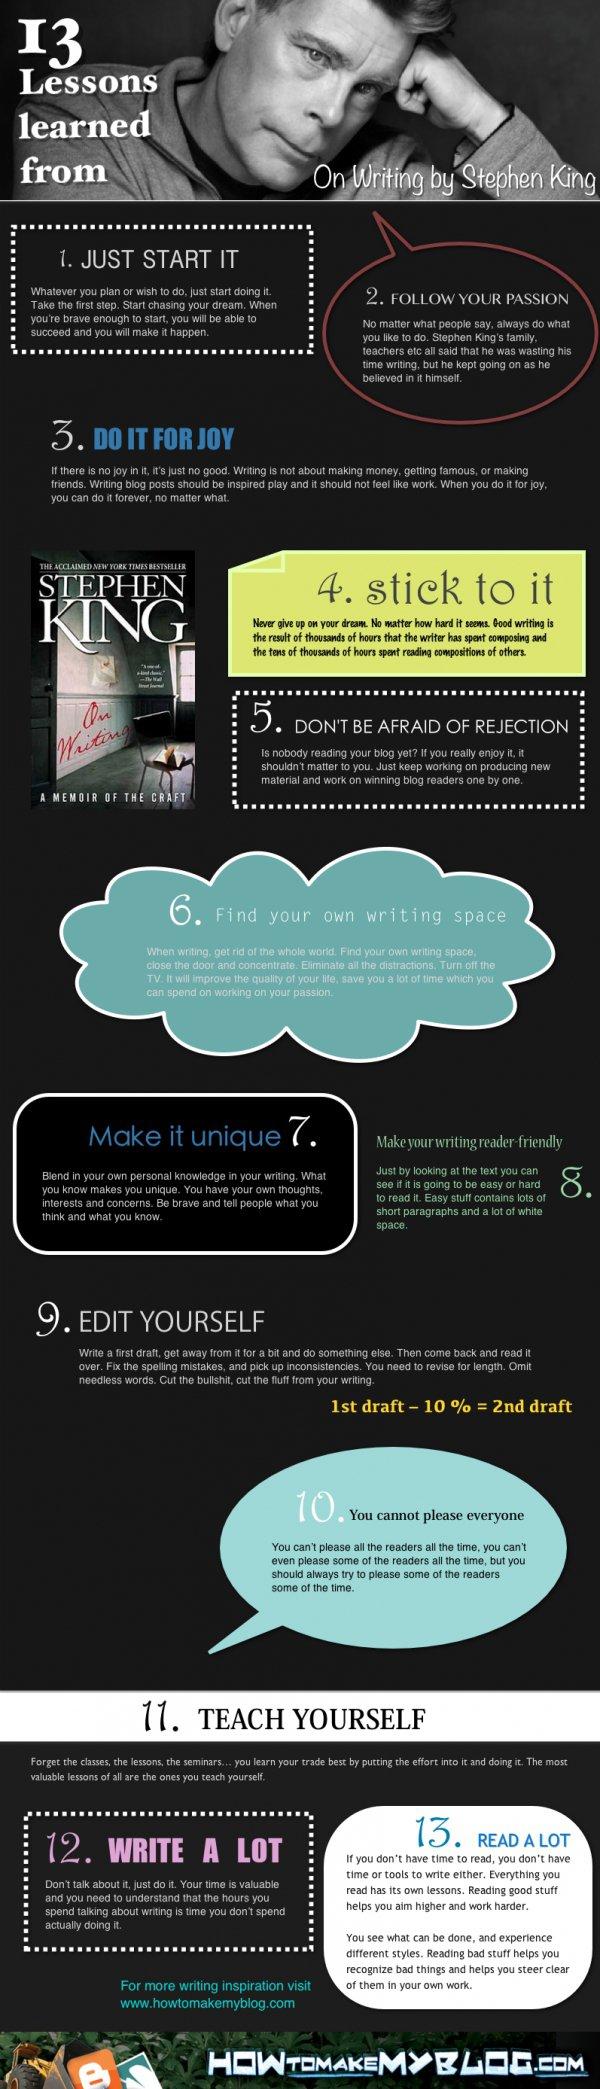 advertising,brand,screenshot,website,Lessons,